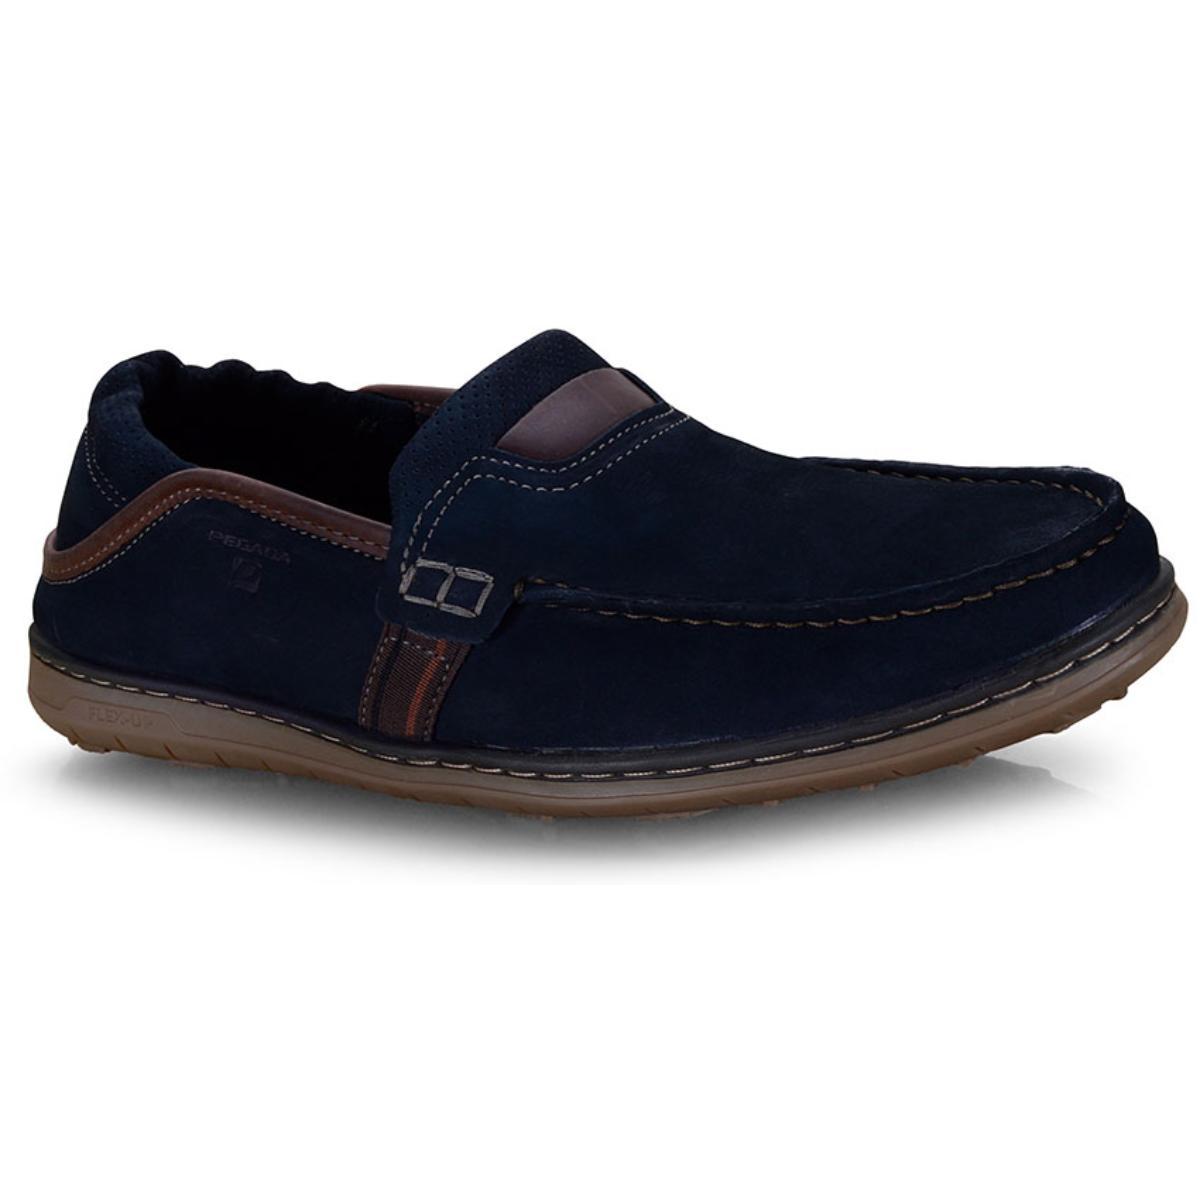 Sapato Masculino Pegada 141101-09 Marinho/coffe